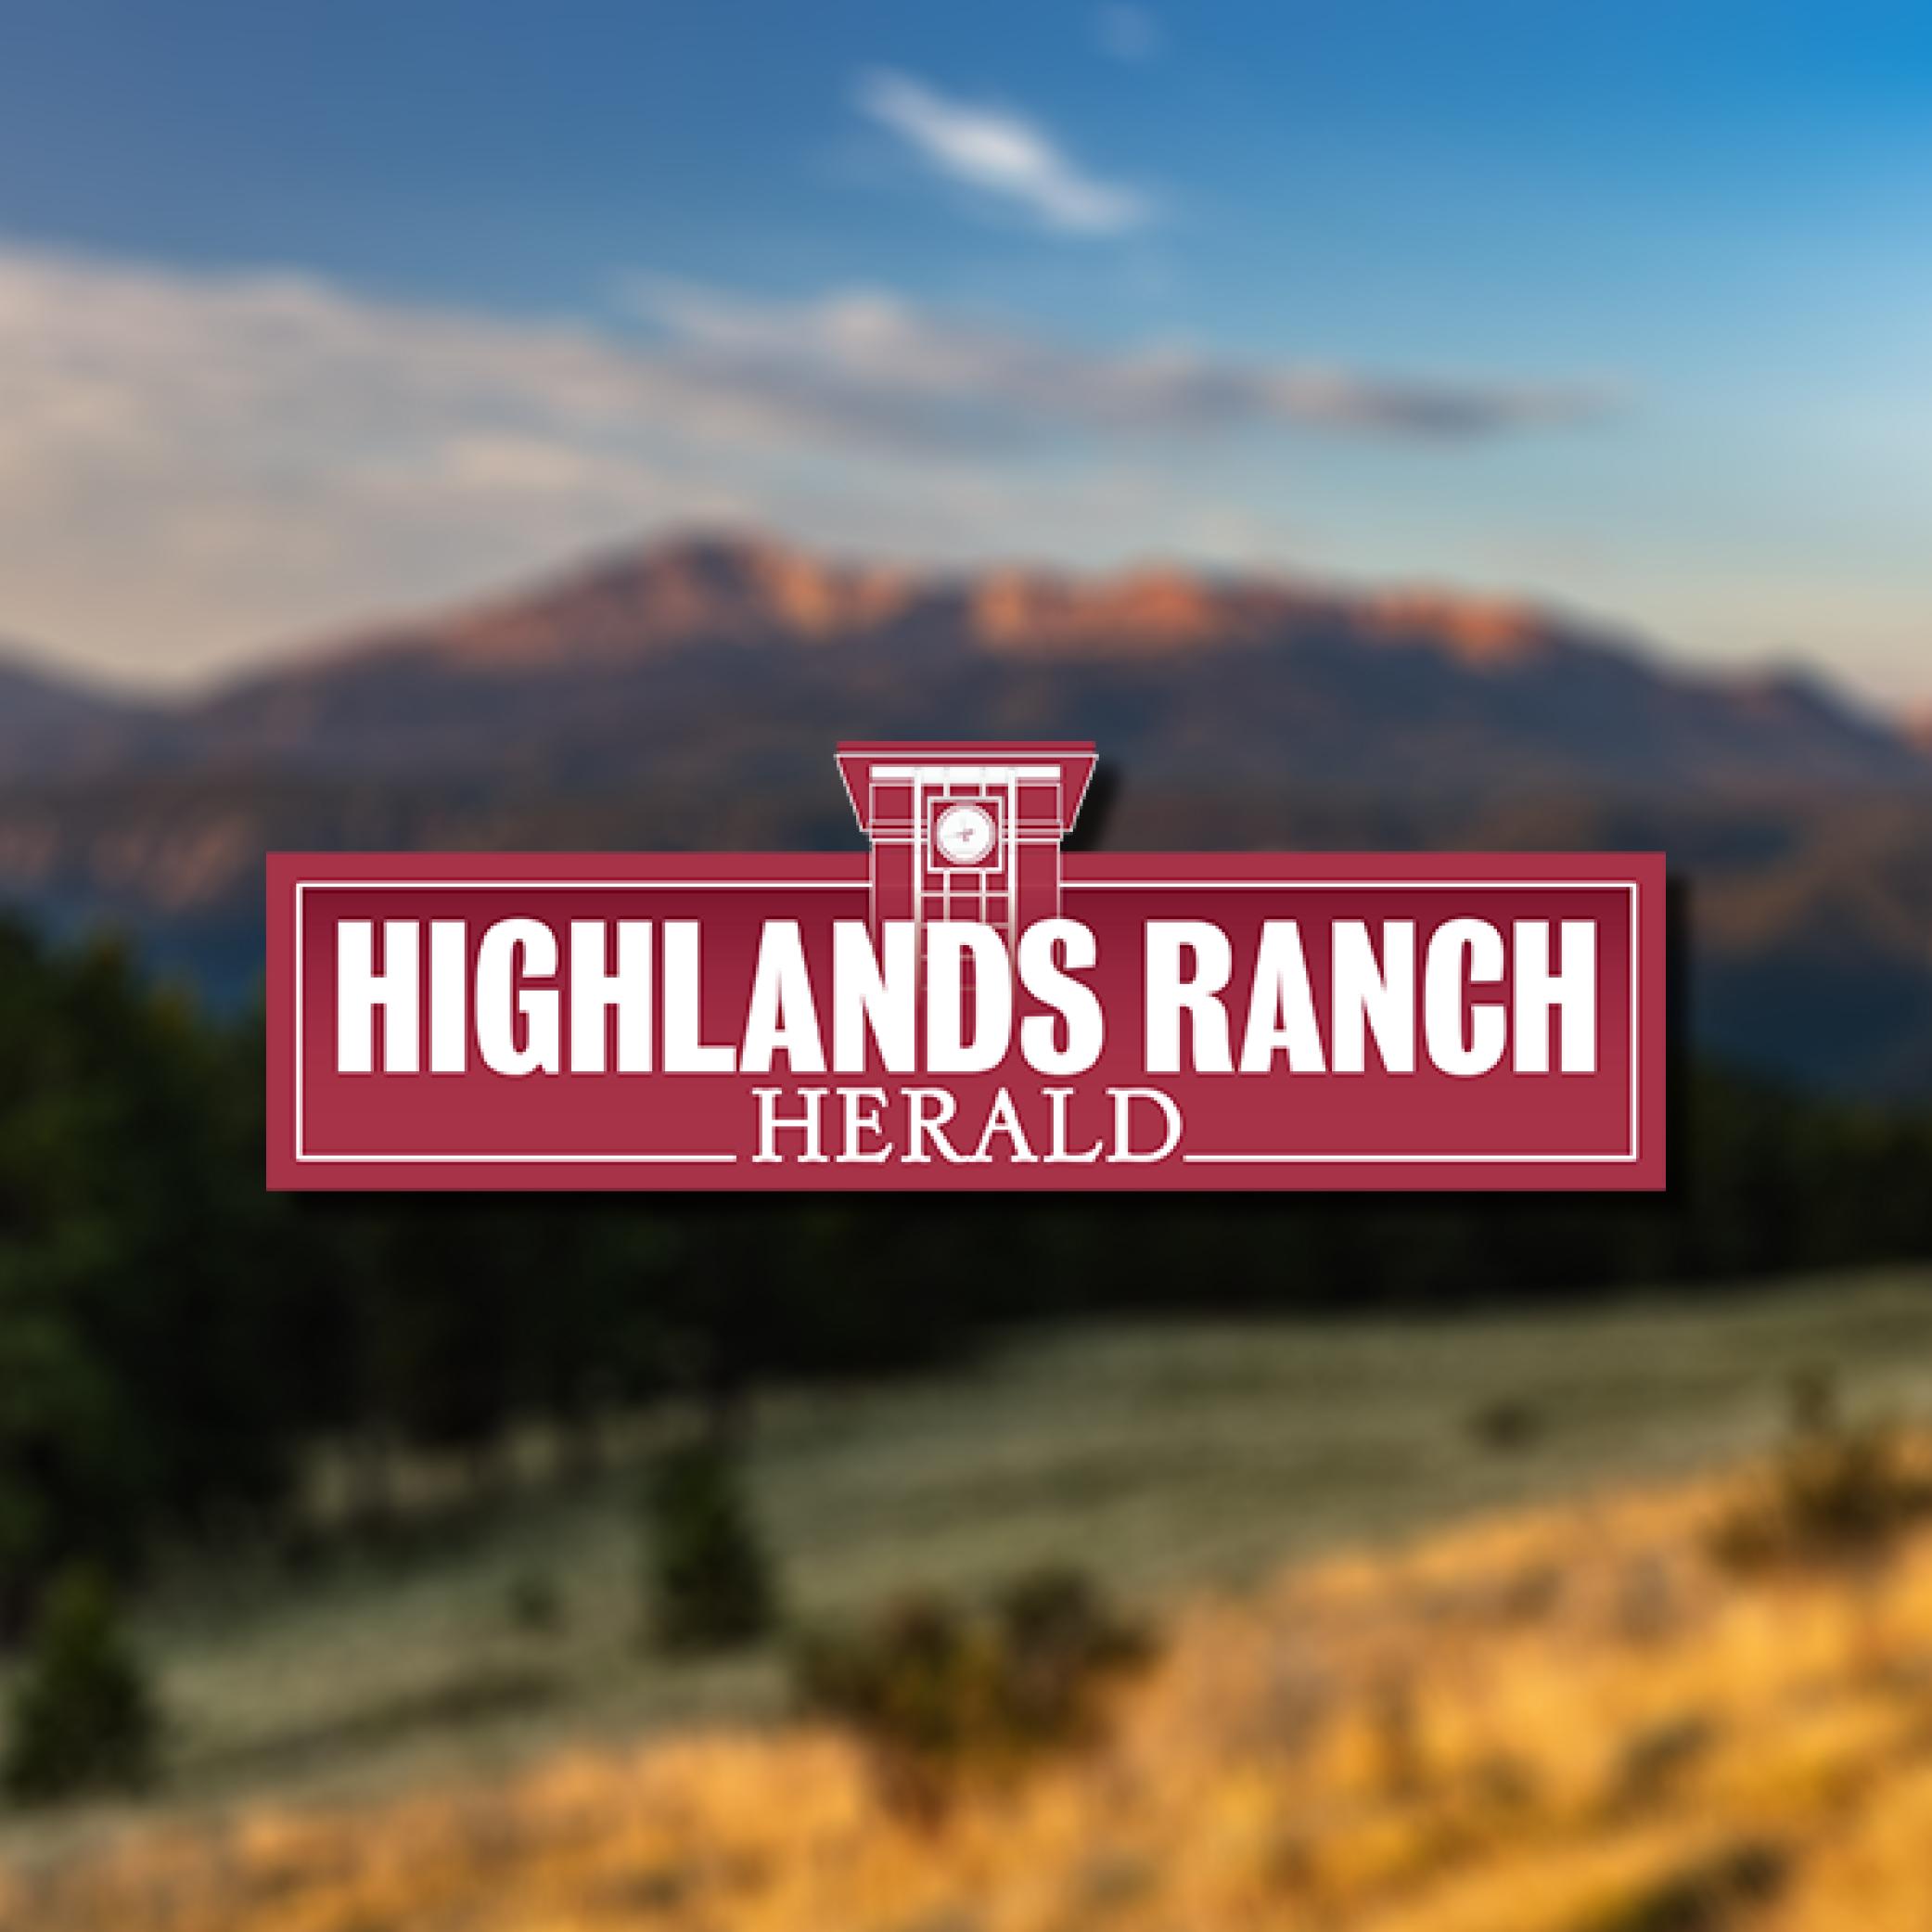 Highlands Ranch Herald